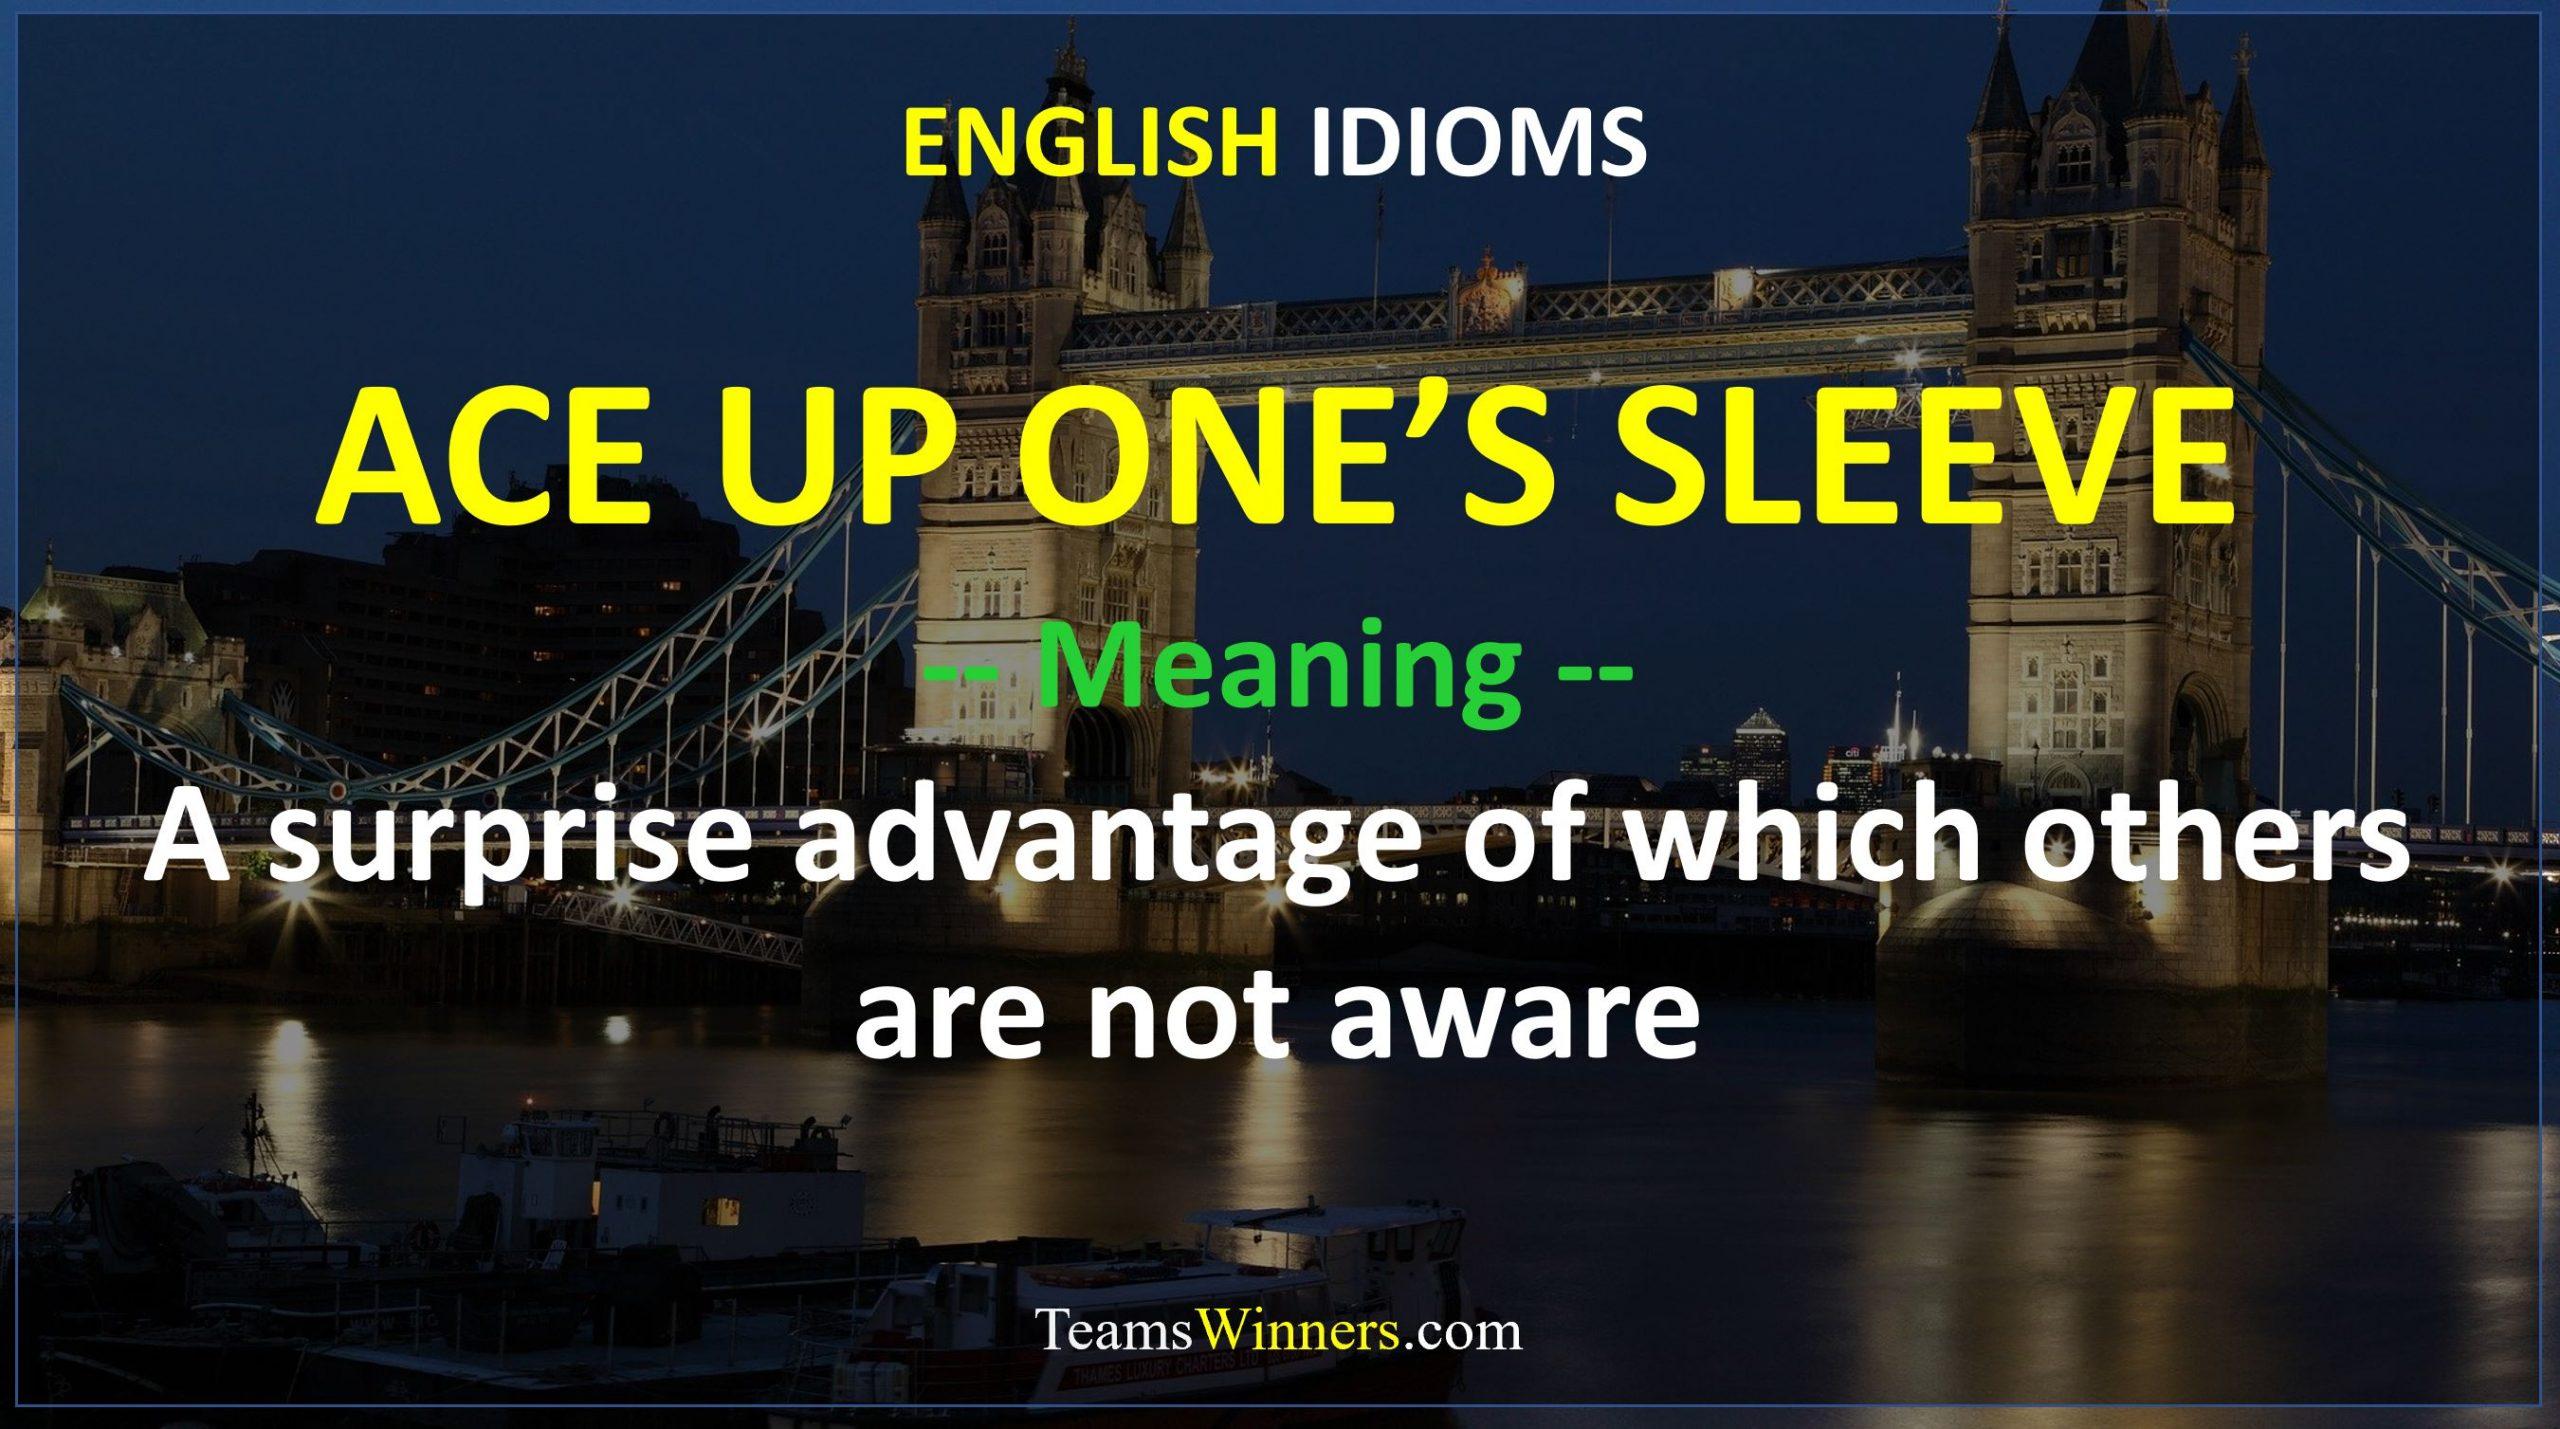 English Idiom - Ace Up One's Sleeve